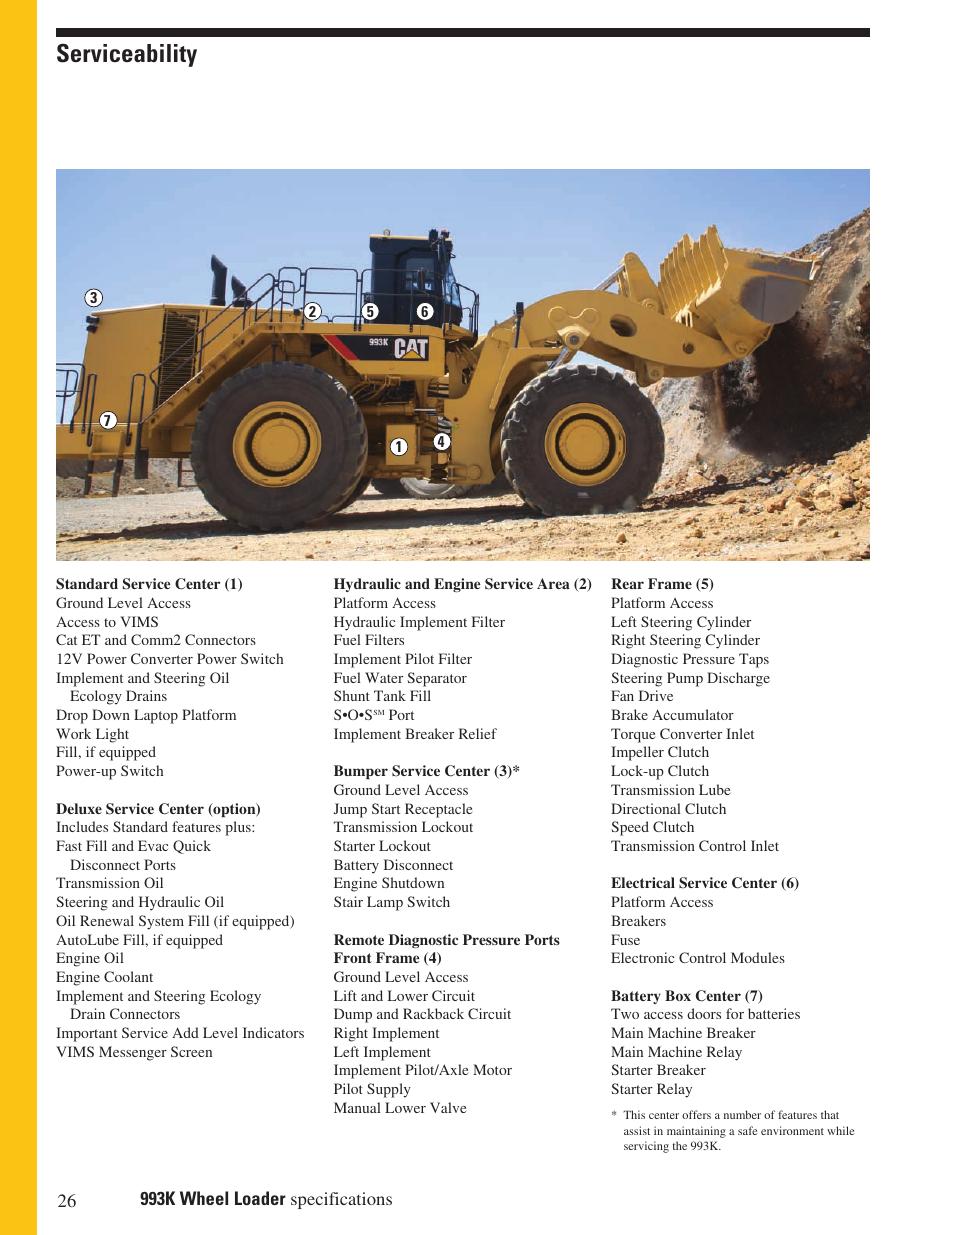 Serviceability | Milton CAT 993K User Manual | Page 26 / 32